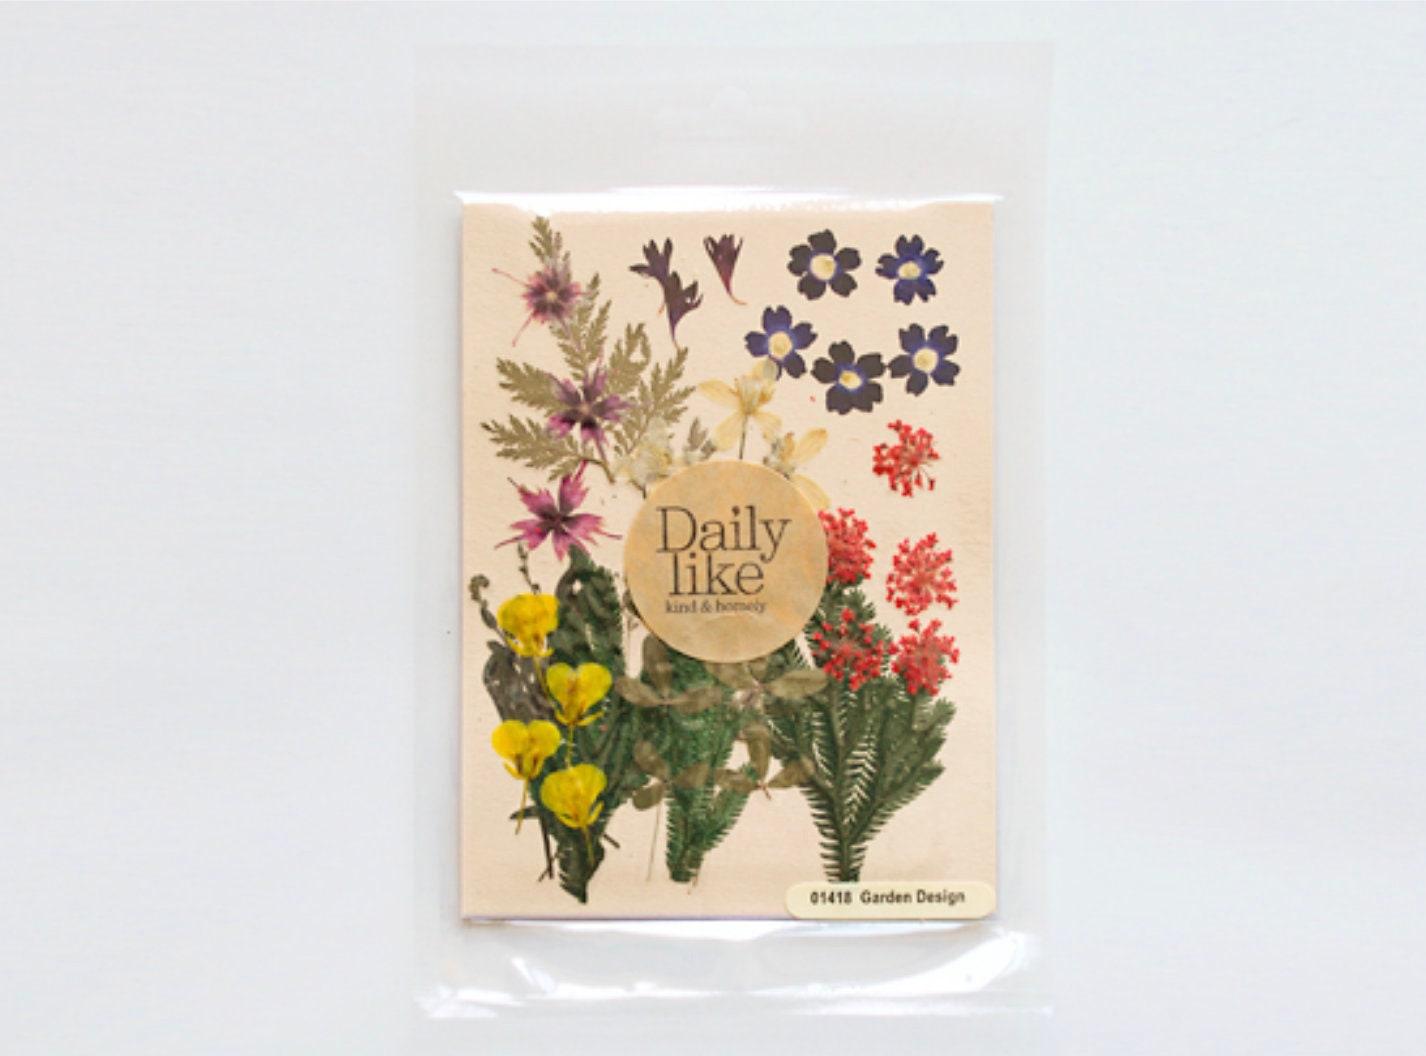 Pressed Flower Garden Design Dry Flower Vintage Flower Etsy